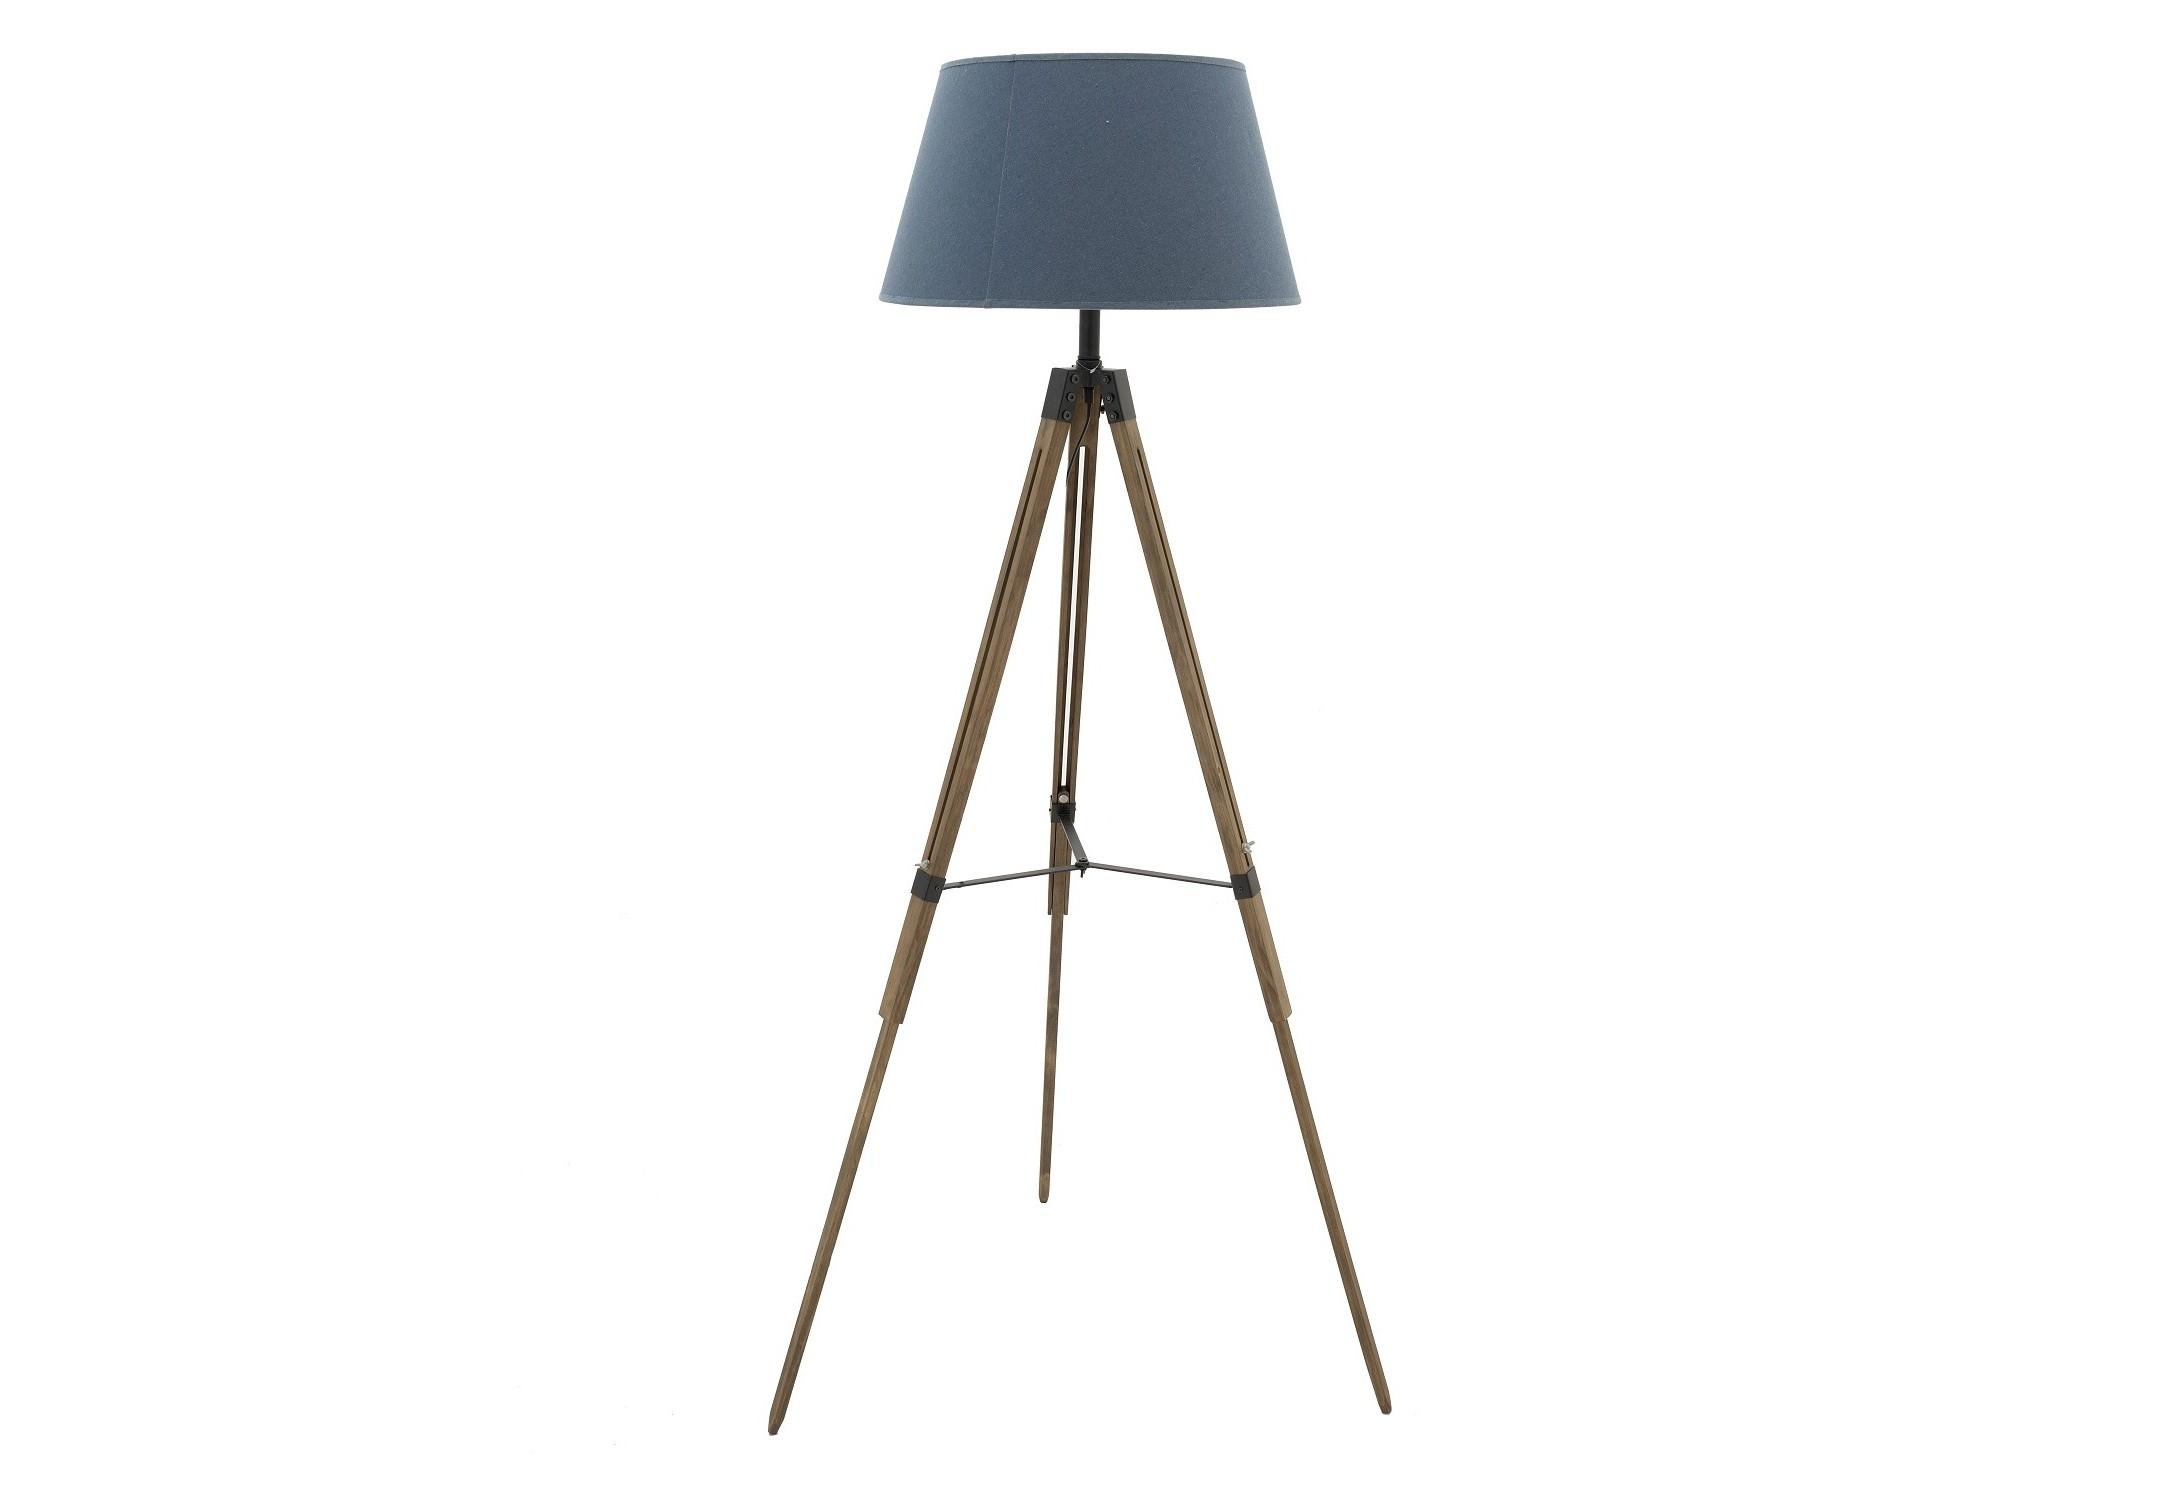 Лампа напольная BorgholmТоршеры<br>&amp;lt;div&amp;gt;Вид цоколя: E27&amp;lt;/div&amp;gt;&amp;lt;div&amp;gt;Мощность: &amp;amp;nbsp;60W&amp;lt;/div&amp;gt;Количество ламп: 1 (нет в комплекте)&amp;lt;div&amp;gt;Длина кабеля: 120 см&amp;lt;div&amp;gt;&amp;lt;br&amp;gt;&amp;lt;div&amp;gt;Материал: металл, пихта.&amp;lt;br&amp;gt;&amp;lt;/div&amp;gt;&amp;lt;/div&amp;gt;&amp;lt;/div&amp;gt;<br><br>Material: Дерево<br>Length см: None<br>Width см: None<br>Height см: 162<br>Diameter см: 50